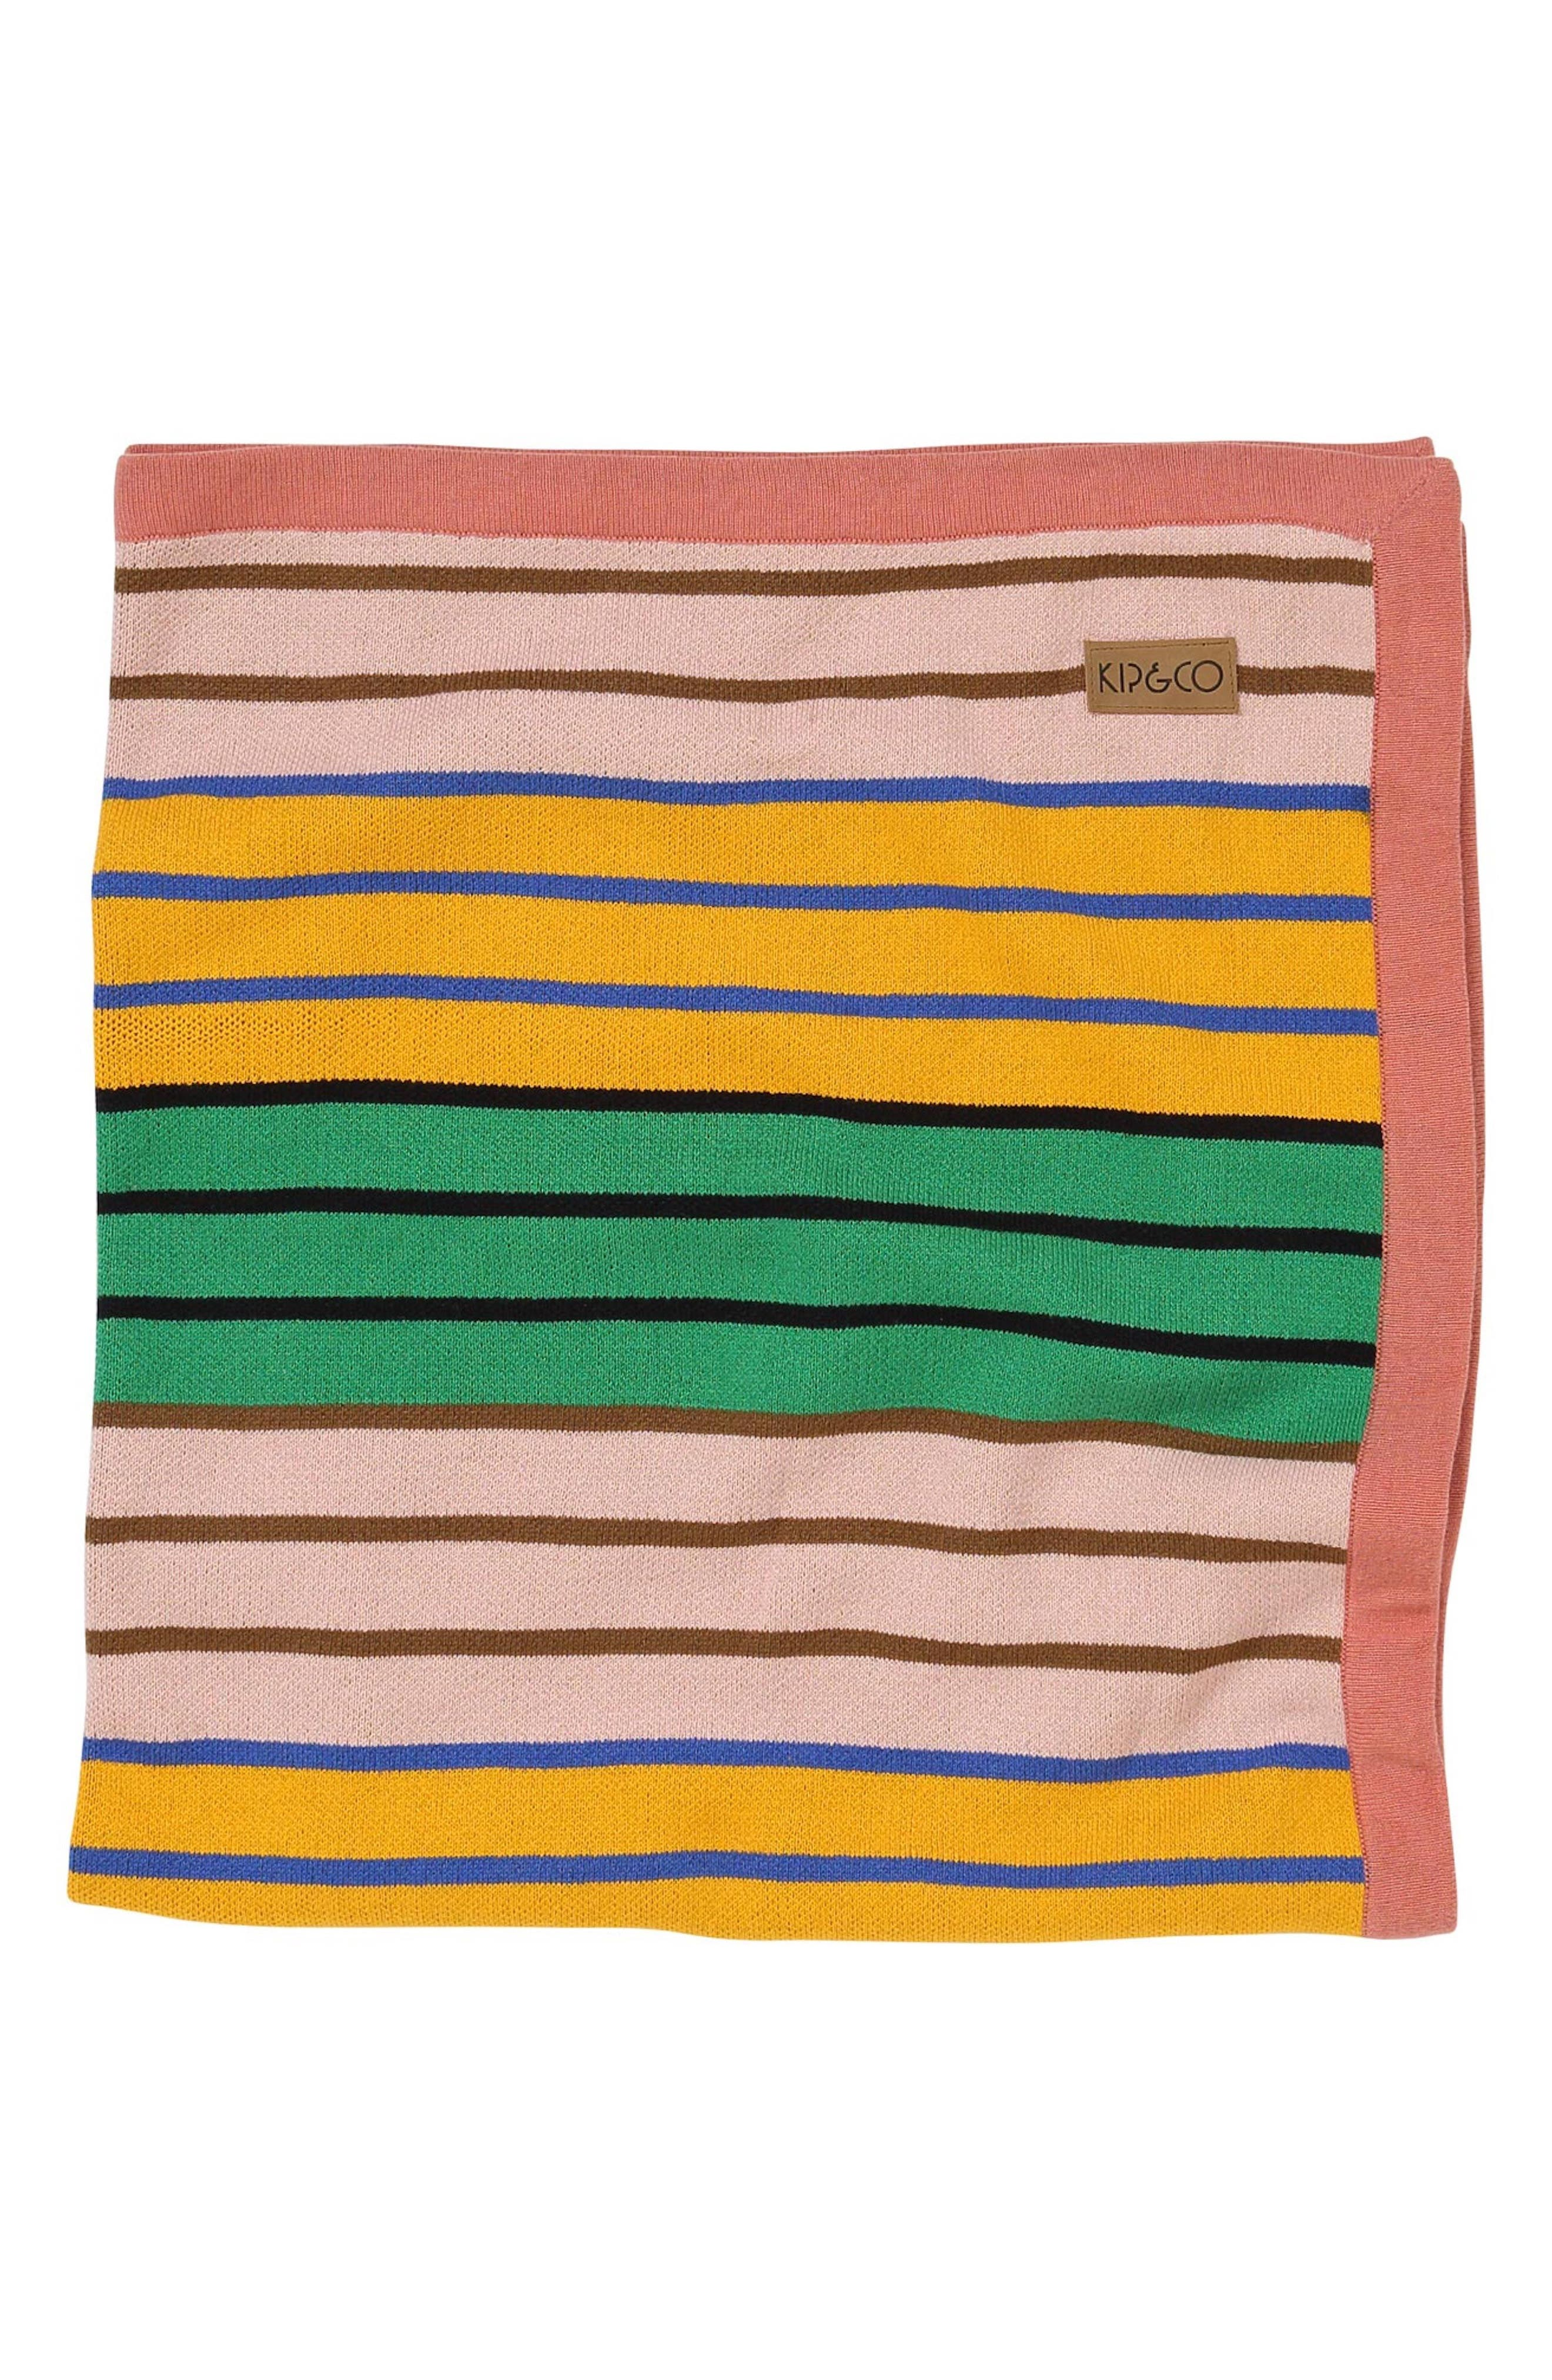 KIP&CO Stripe Knit Cotton Blanket, Main, color, 300